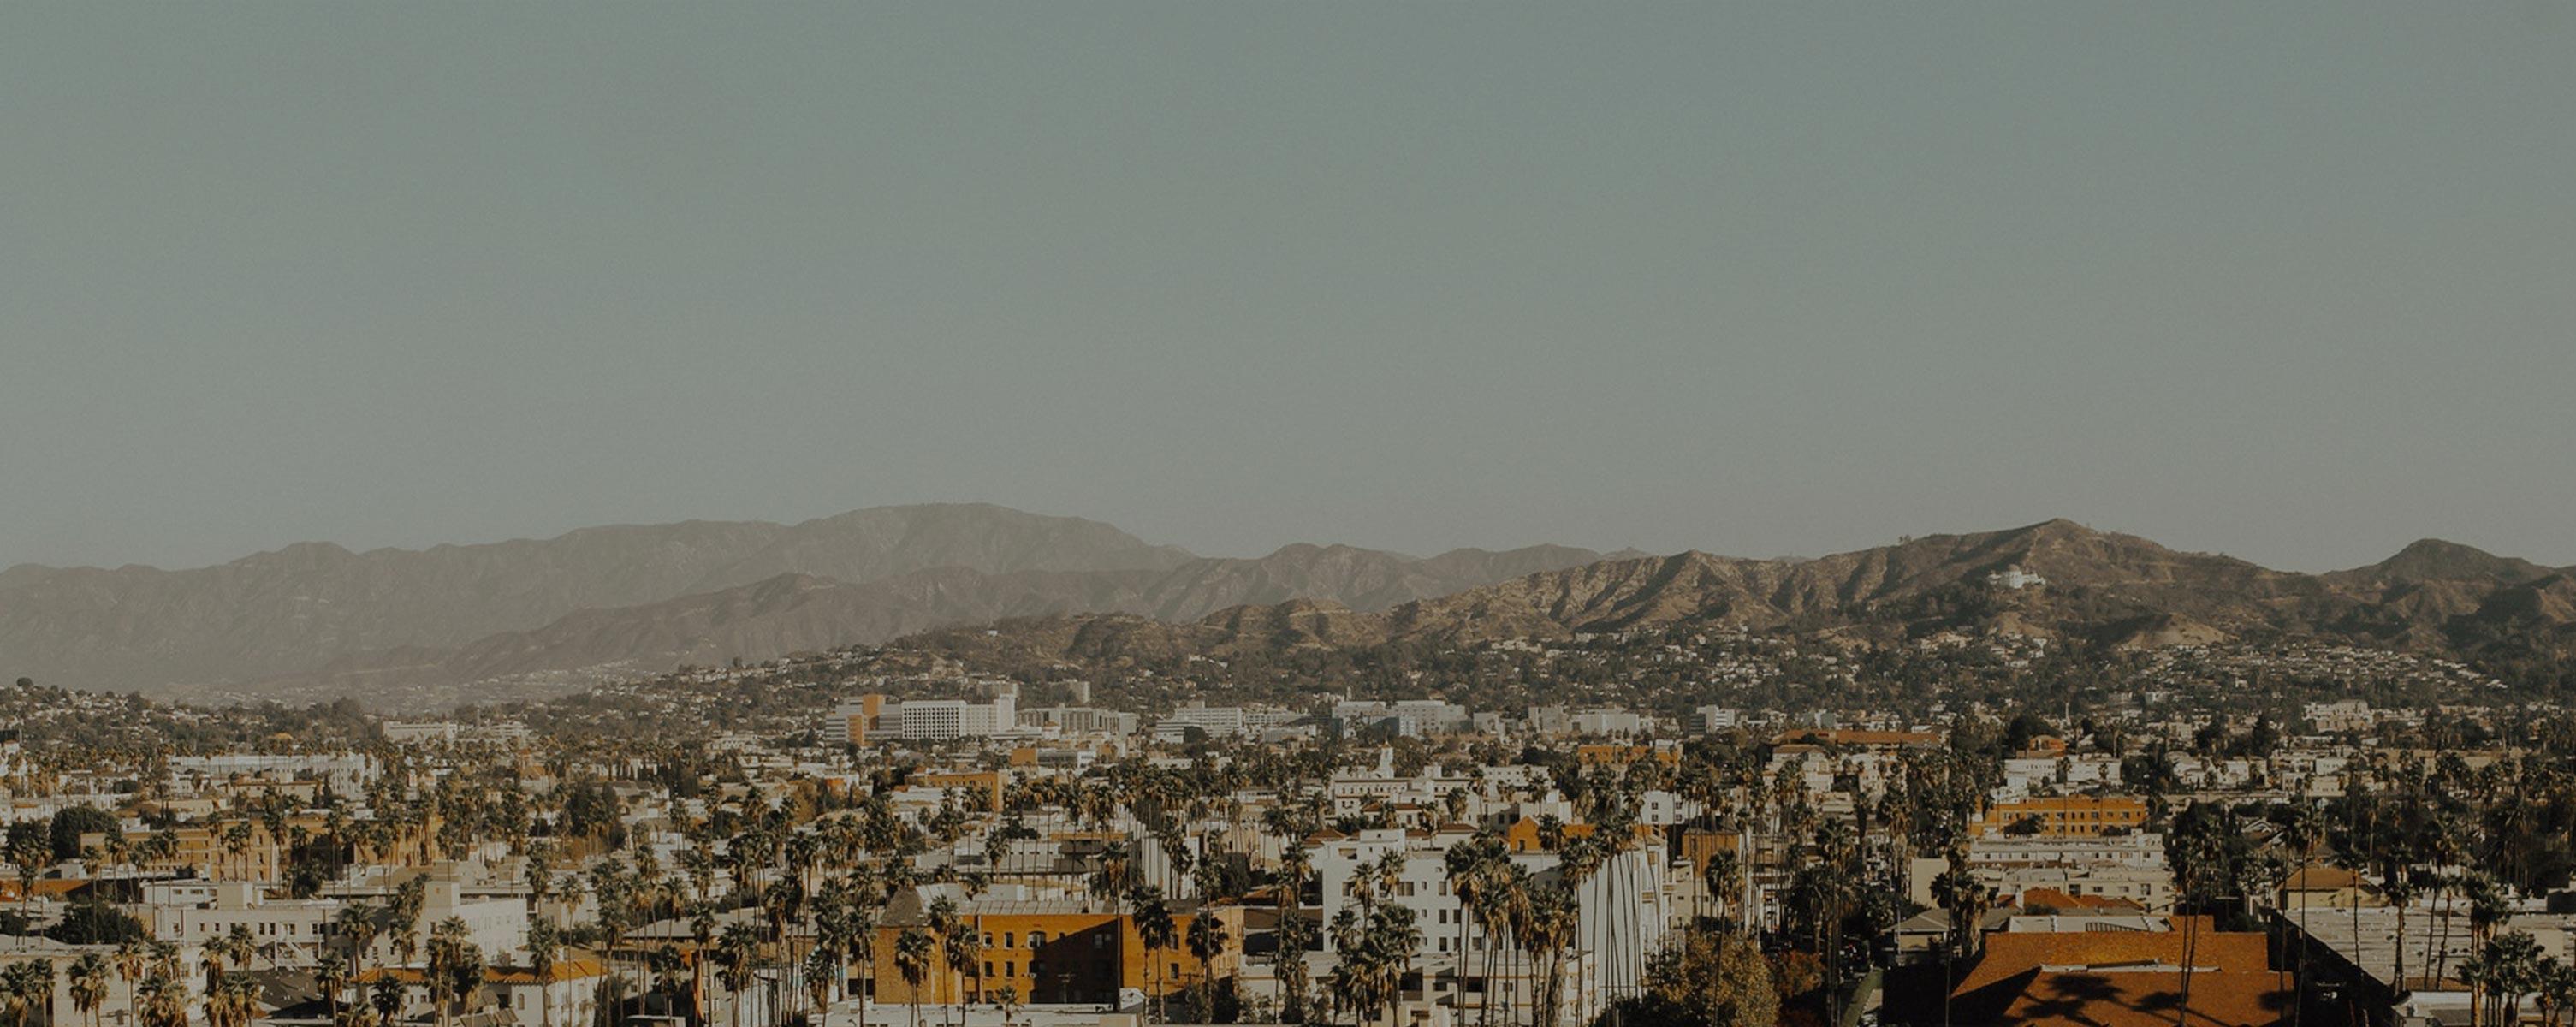 Los Angeles | Slalom